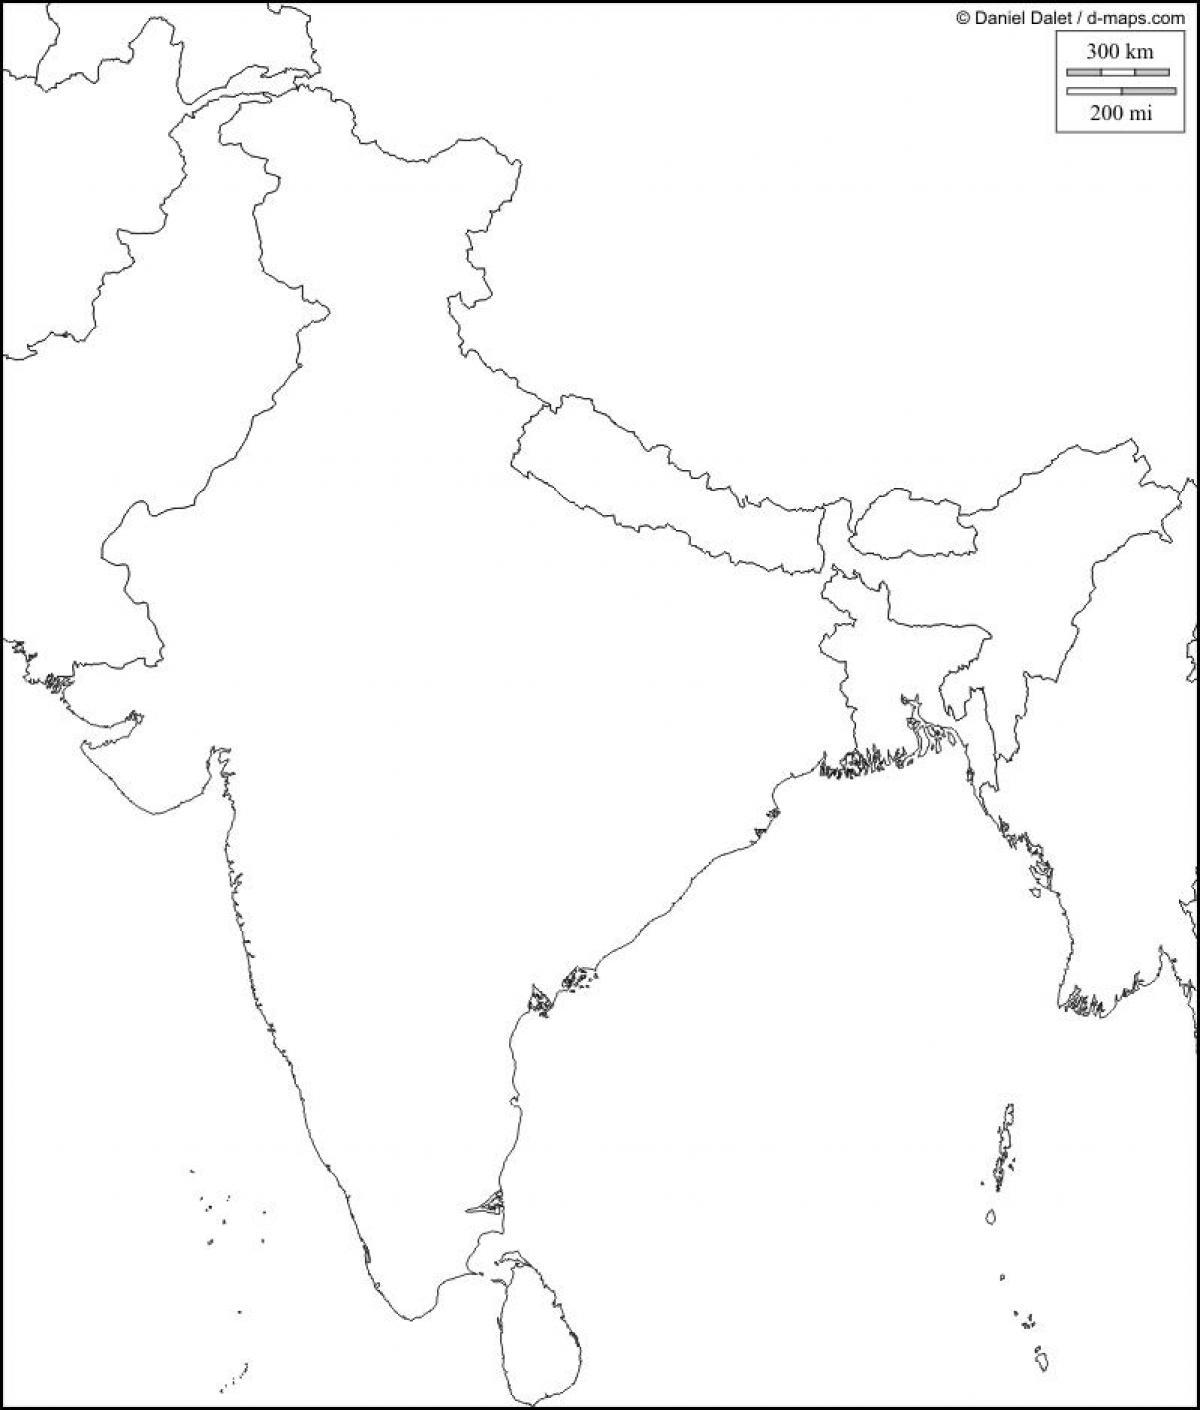 Carte Inde Vierge.Carte Physique De L Inde Vide Inde Carte Physique Vierge